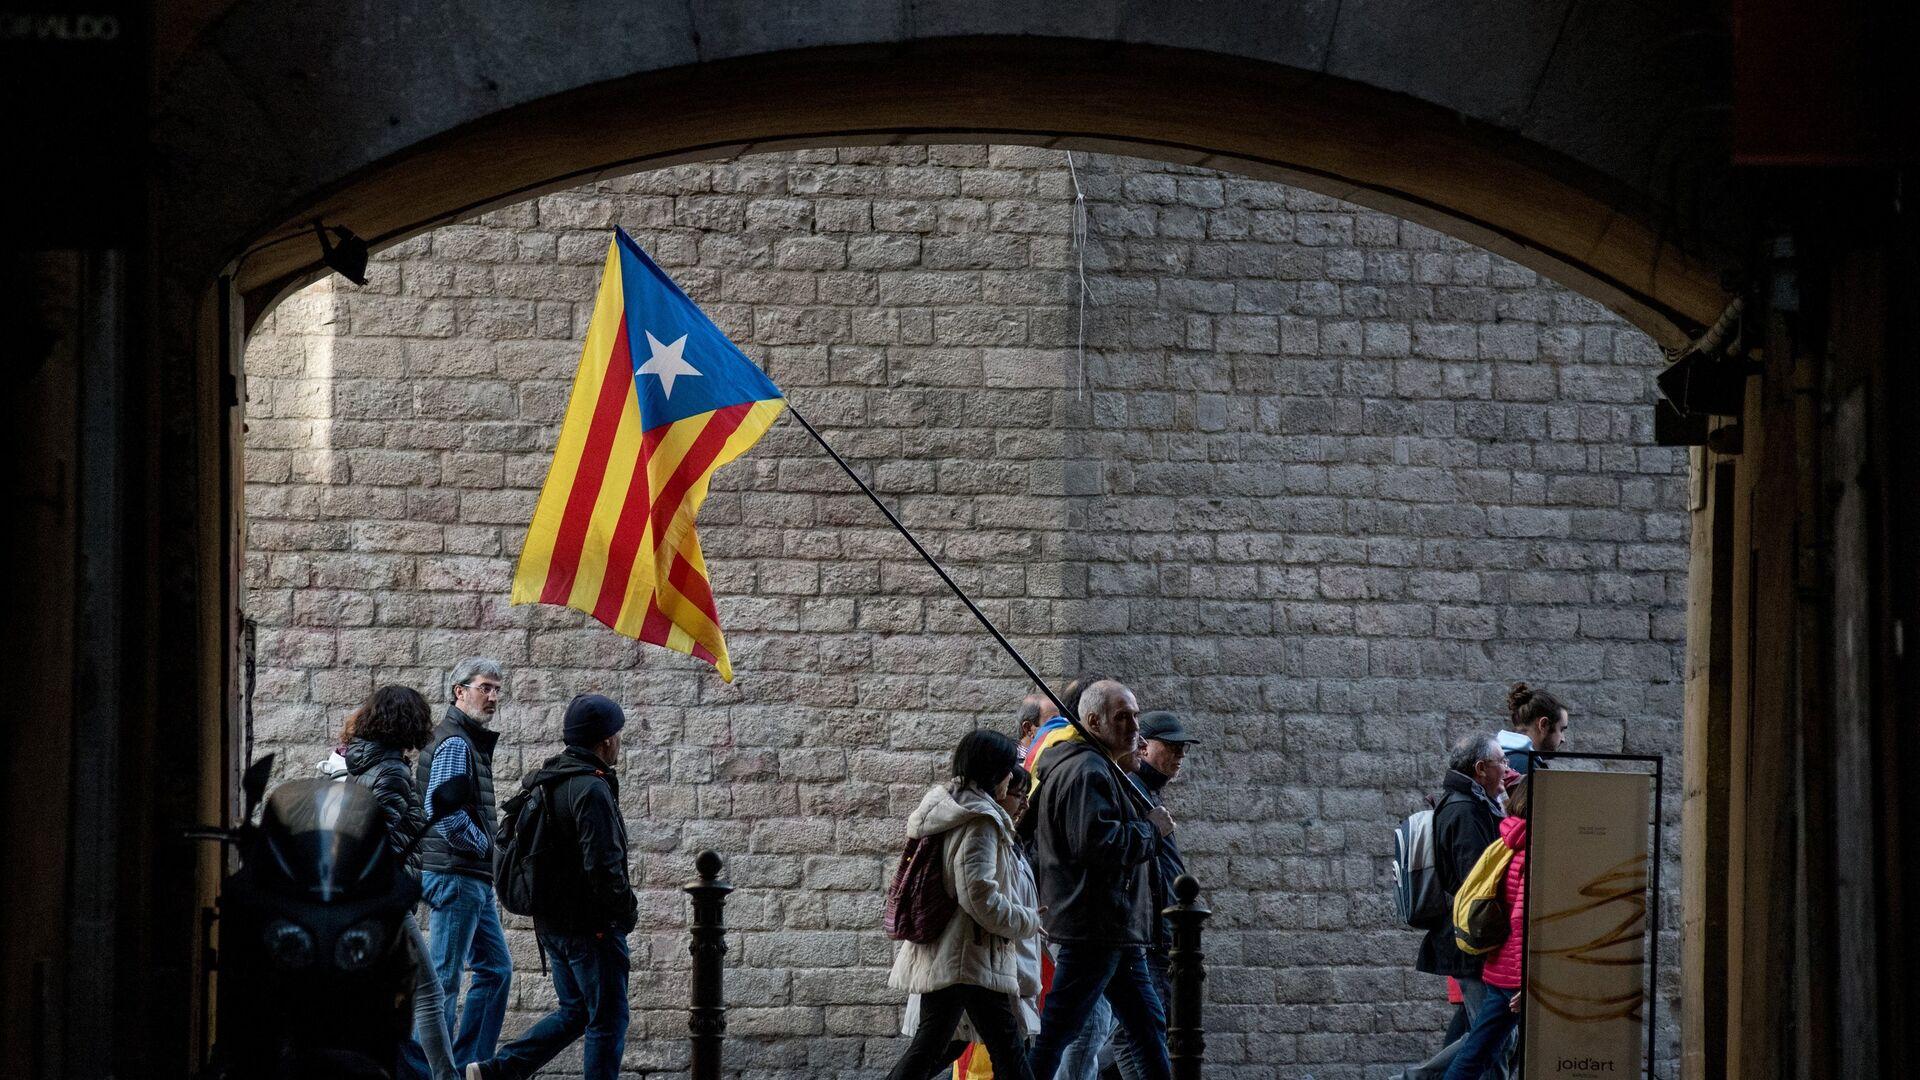 Manifestación independentista en Barcelona - Sputnik Mundo, 1920, 08.02.2021